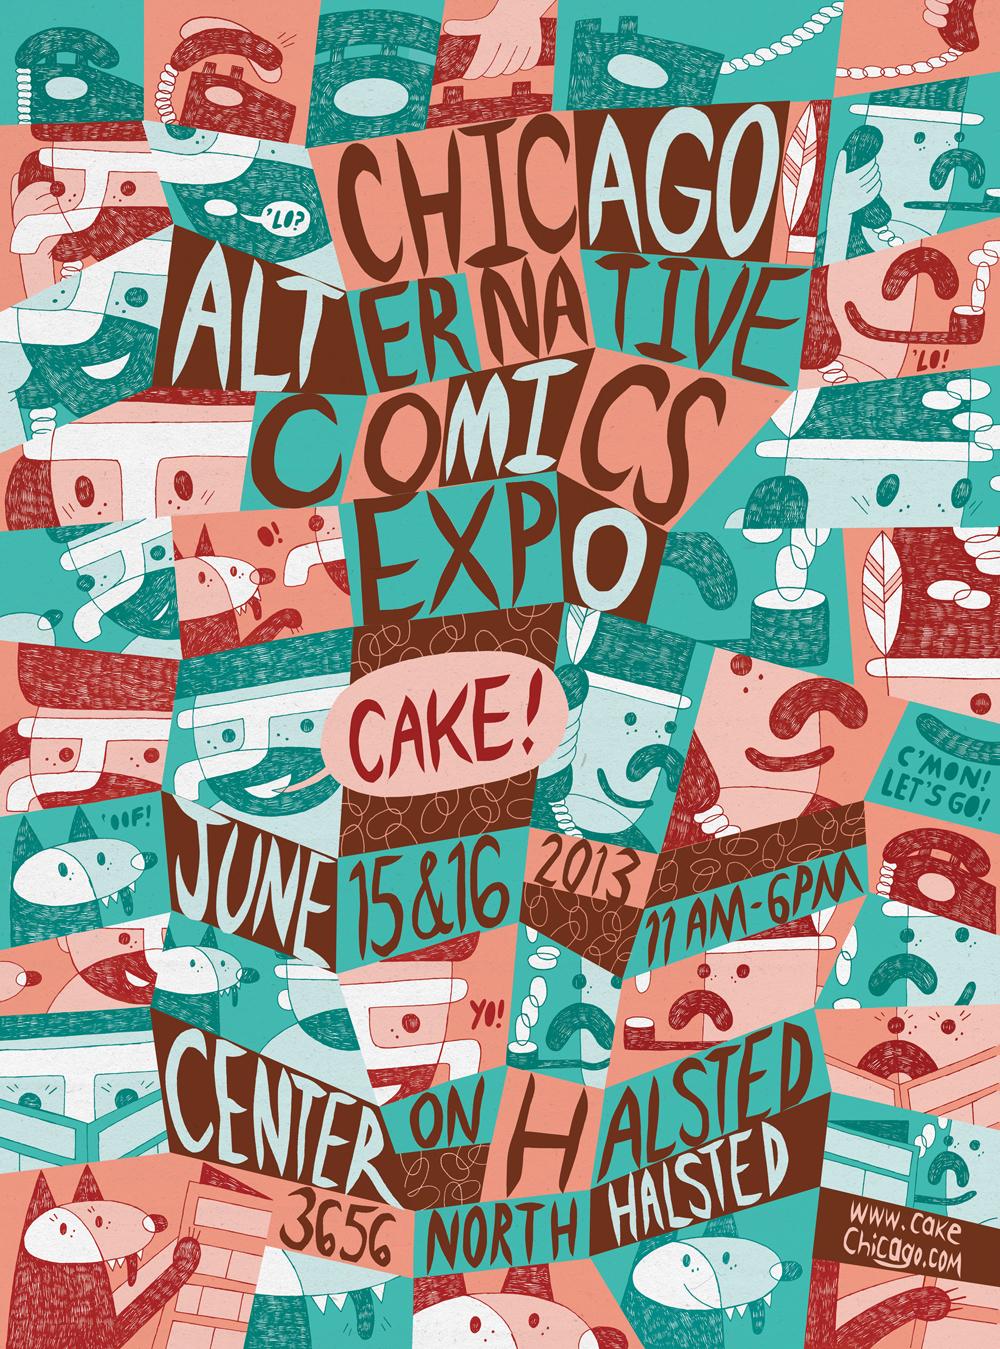 chicago alternative comics expo - HD1000×1349